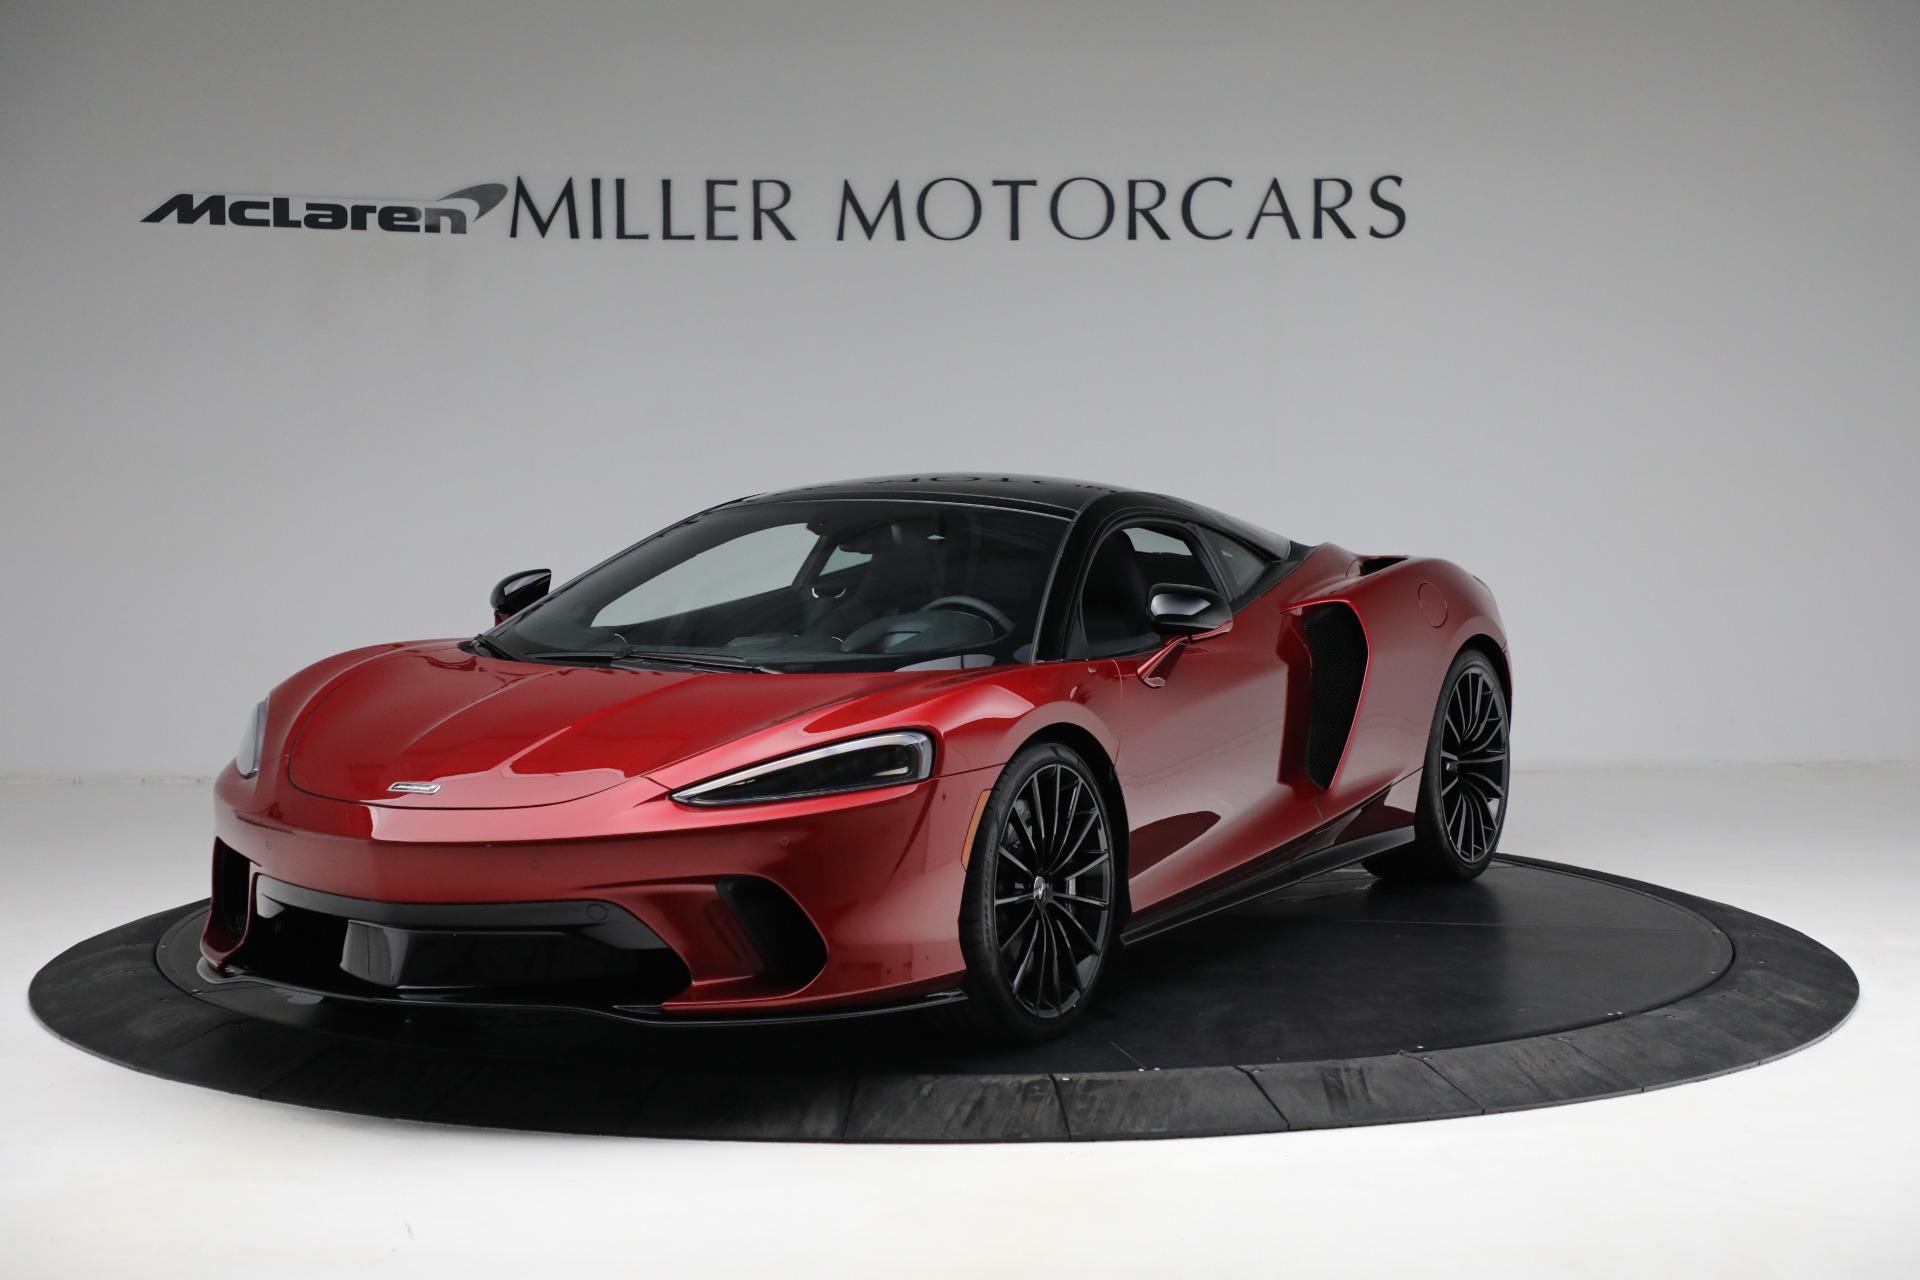 New 2021 McLaren GT Luxe for sale $217,275 at McLaren Greenwich in Greenwich CT 06830 1